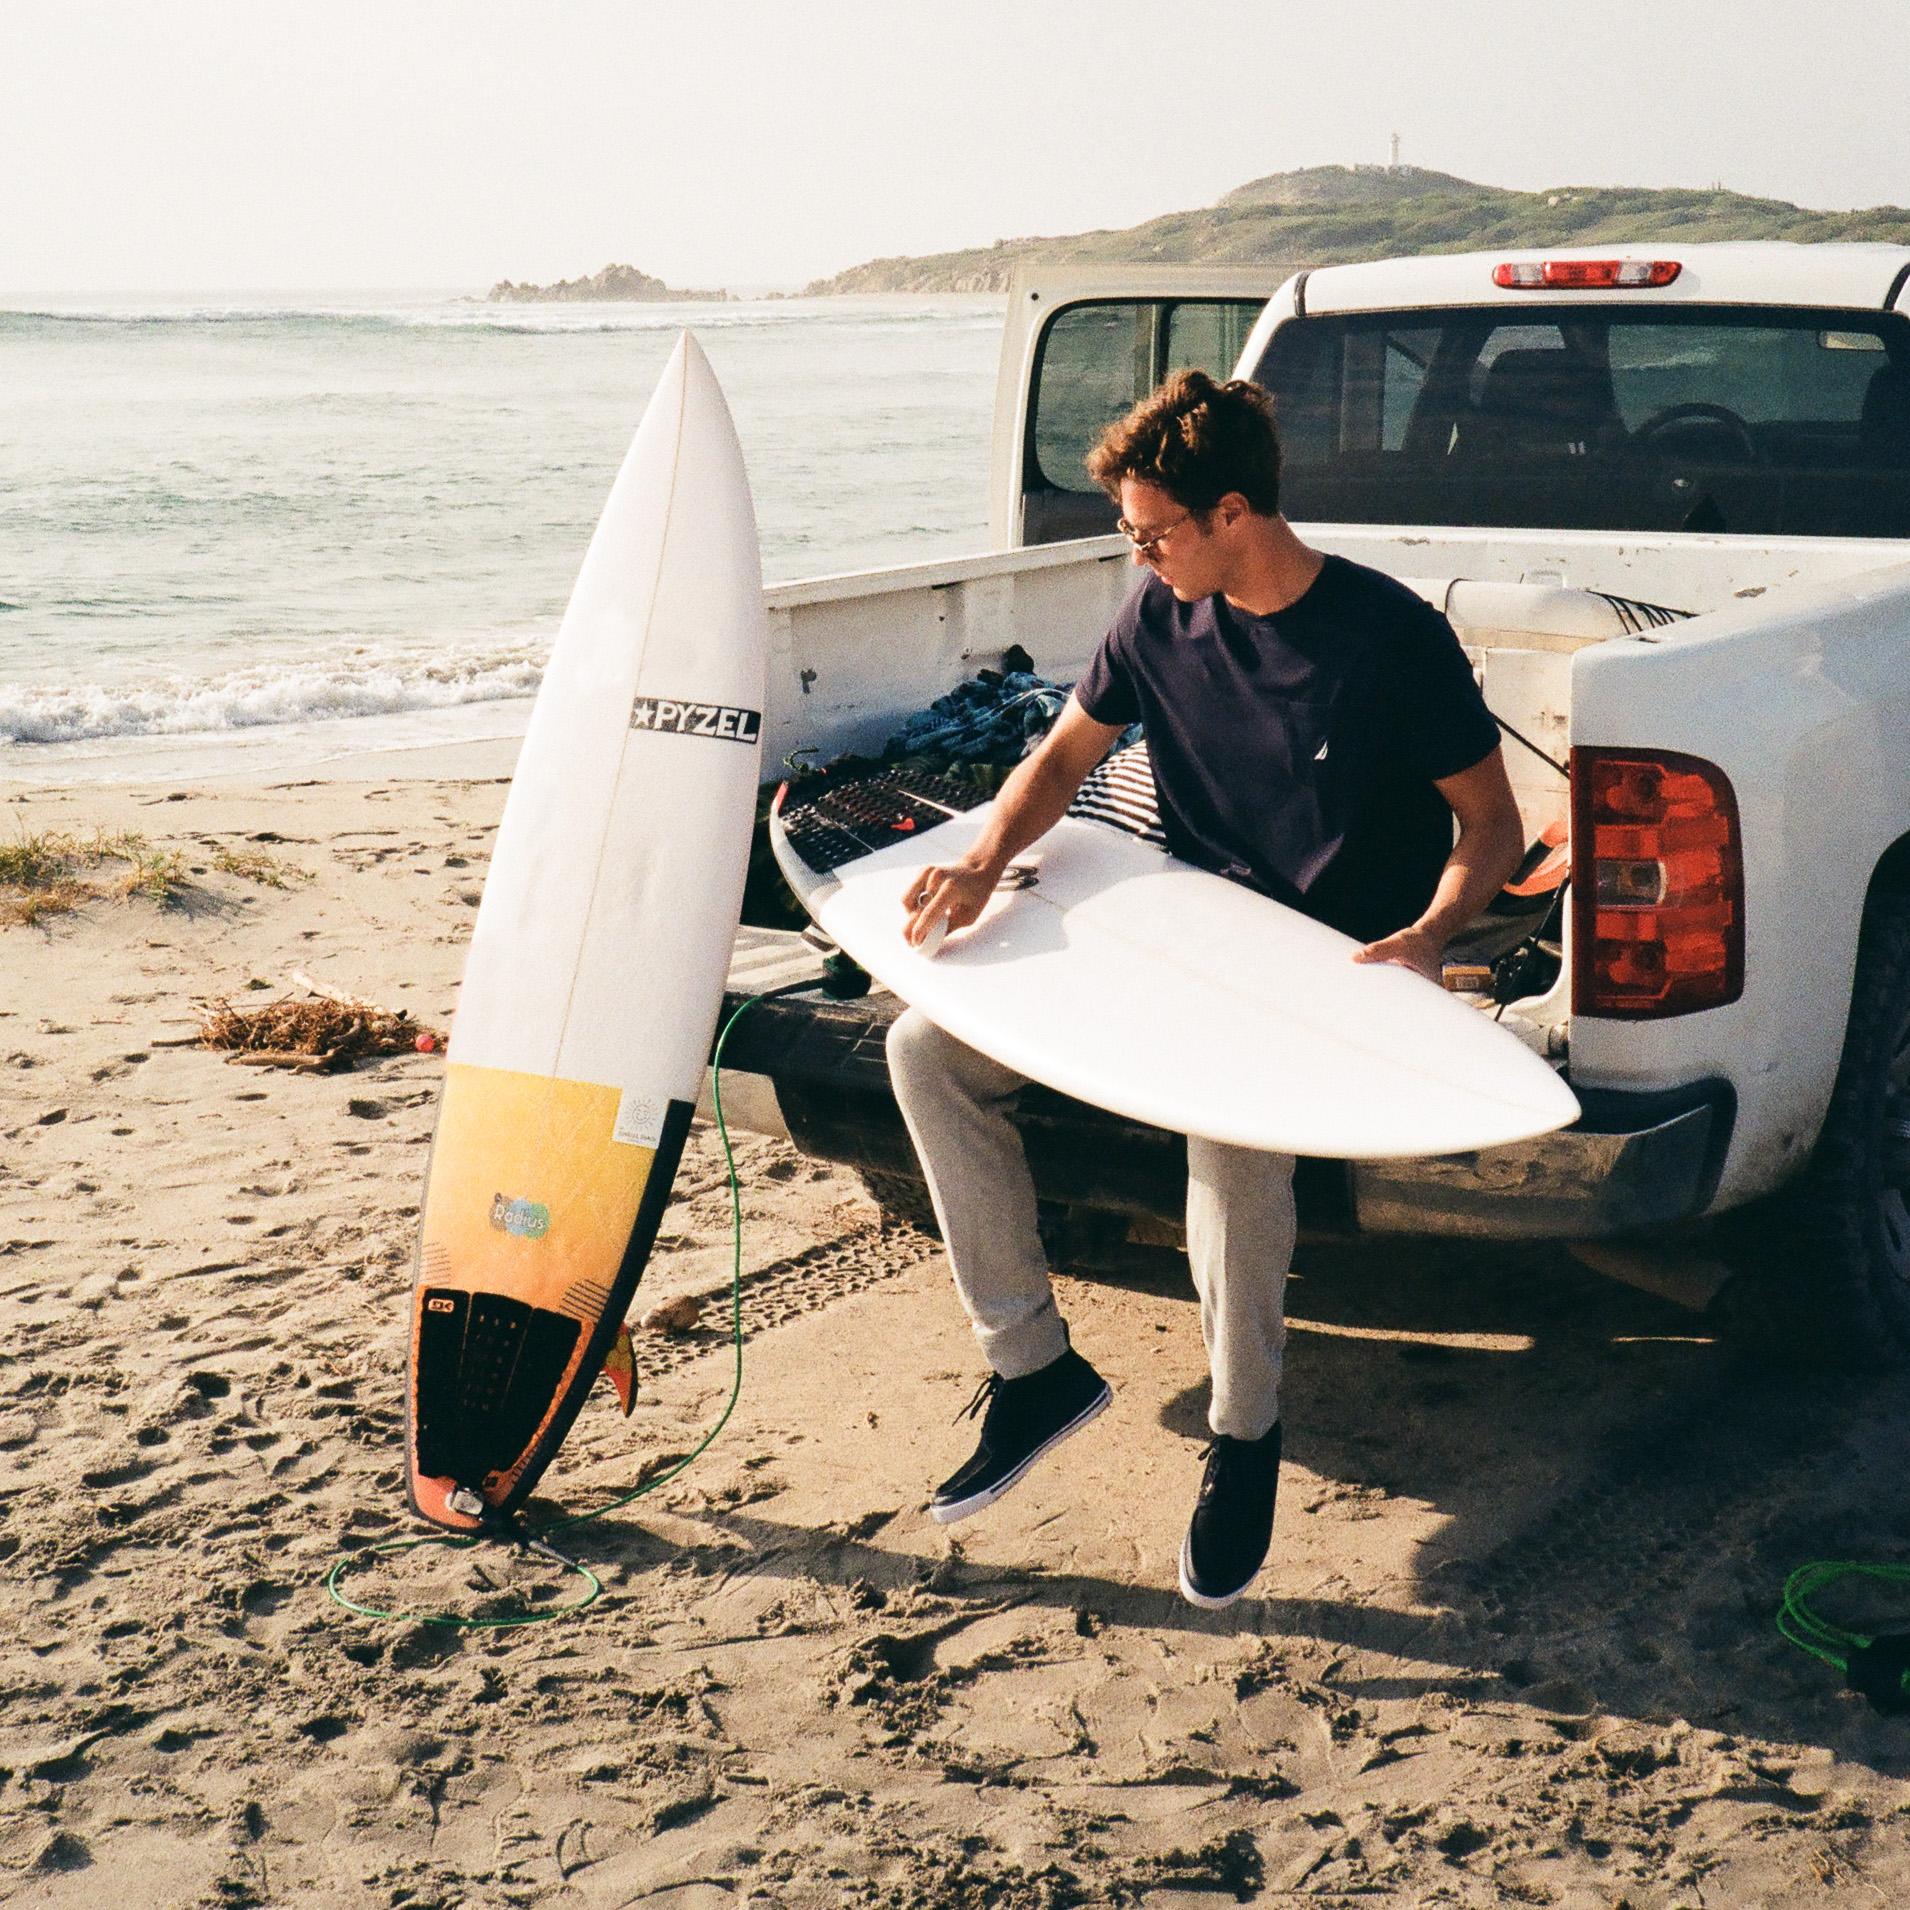 captainbarto-blog-adambartoshesky-model-nautica-client-mexico-surf-trip-mexican-mirage-september-2018--3.jpg